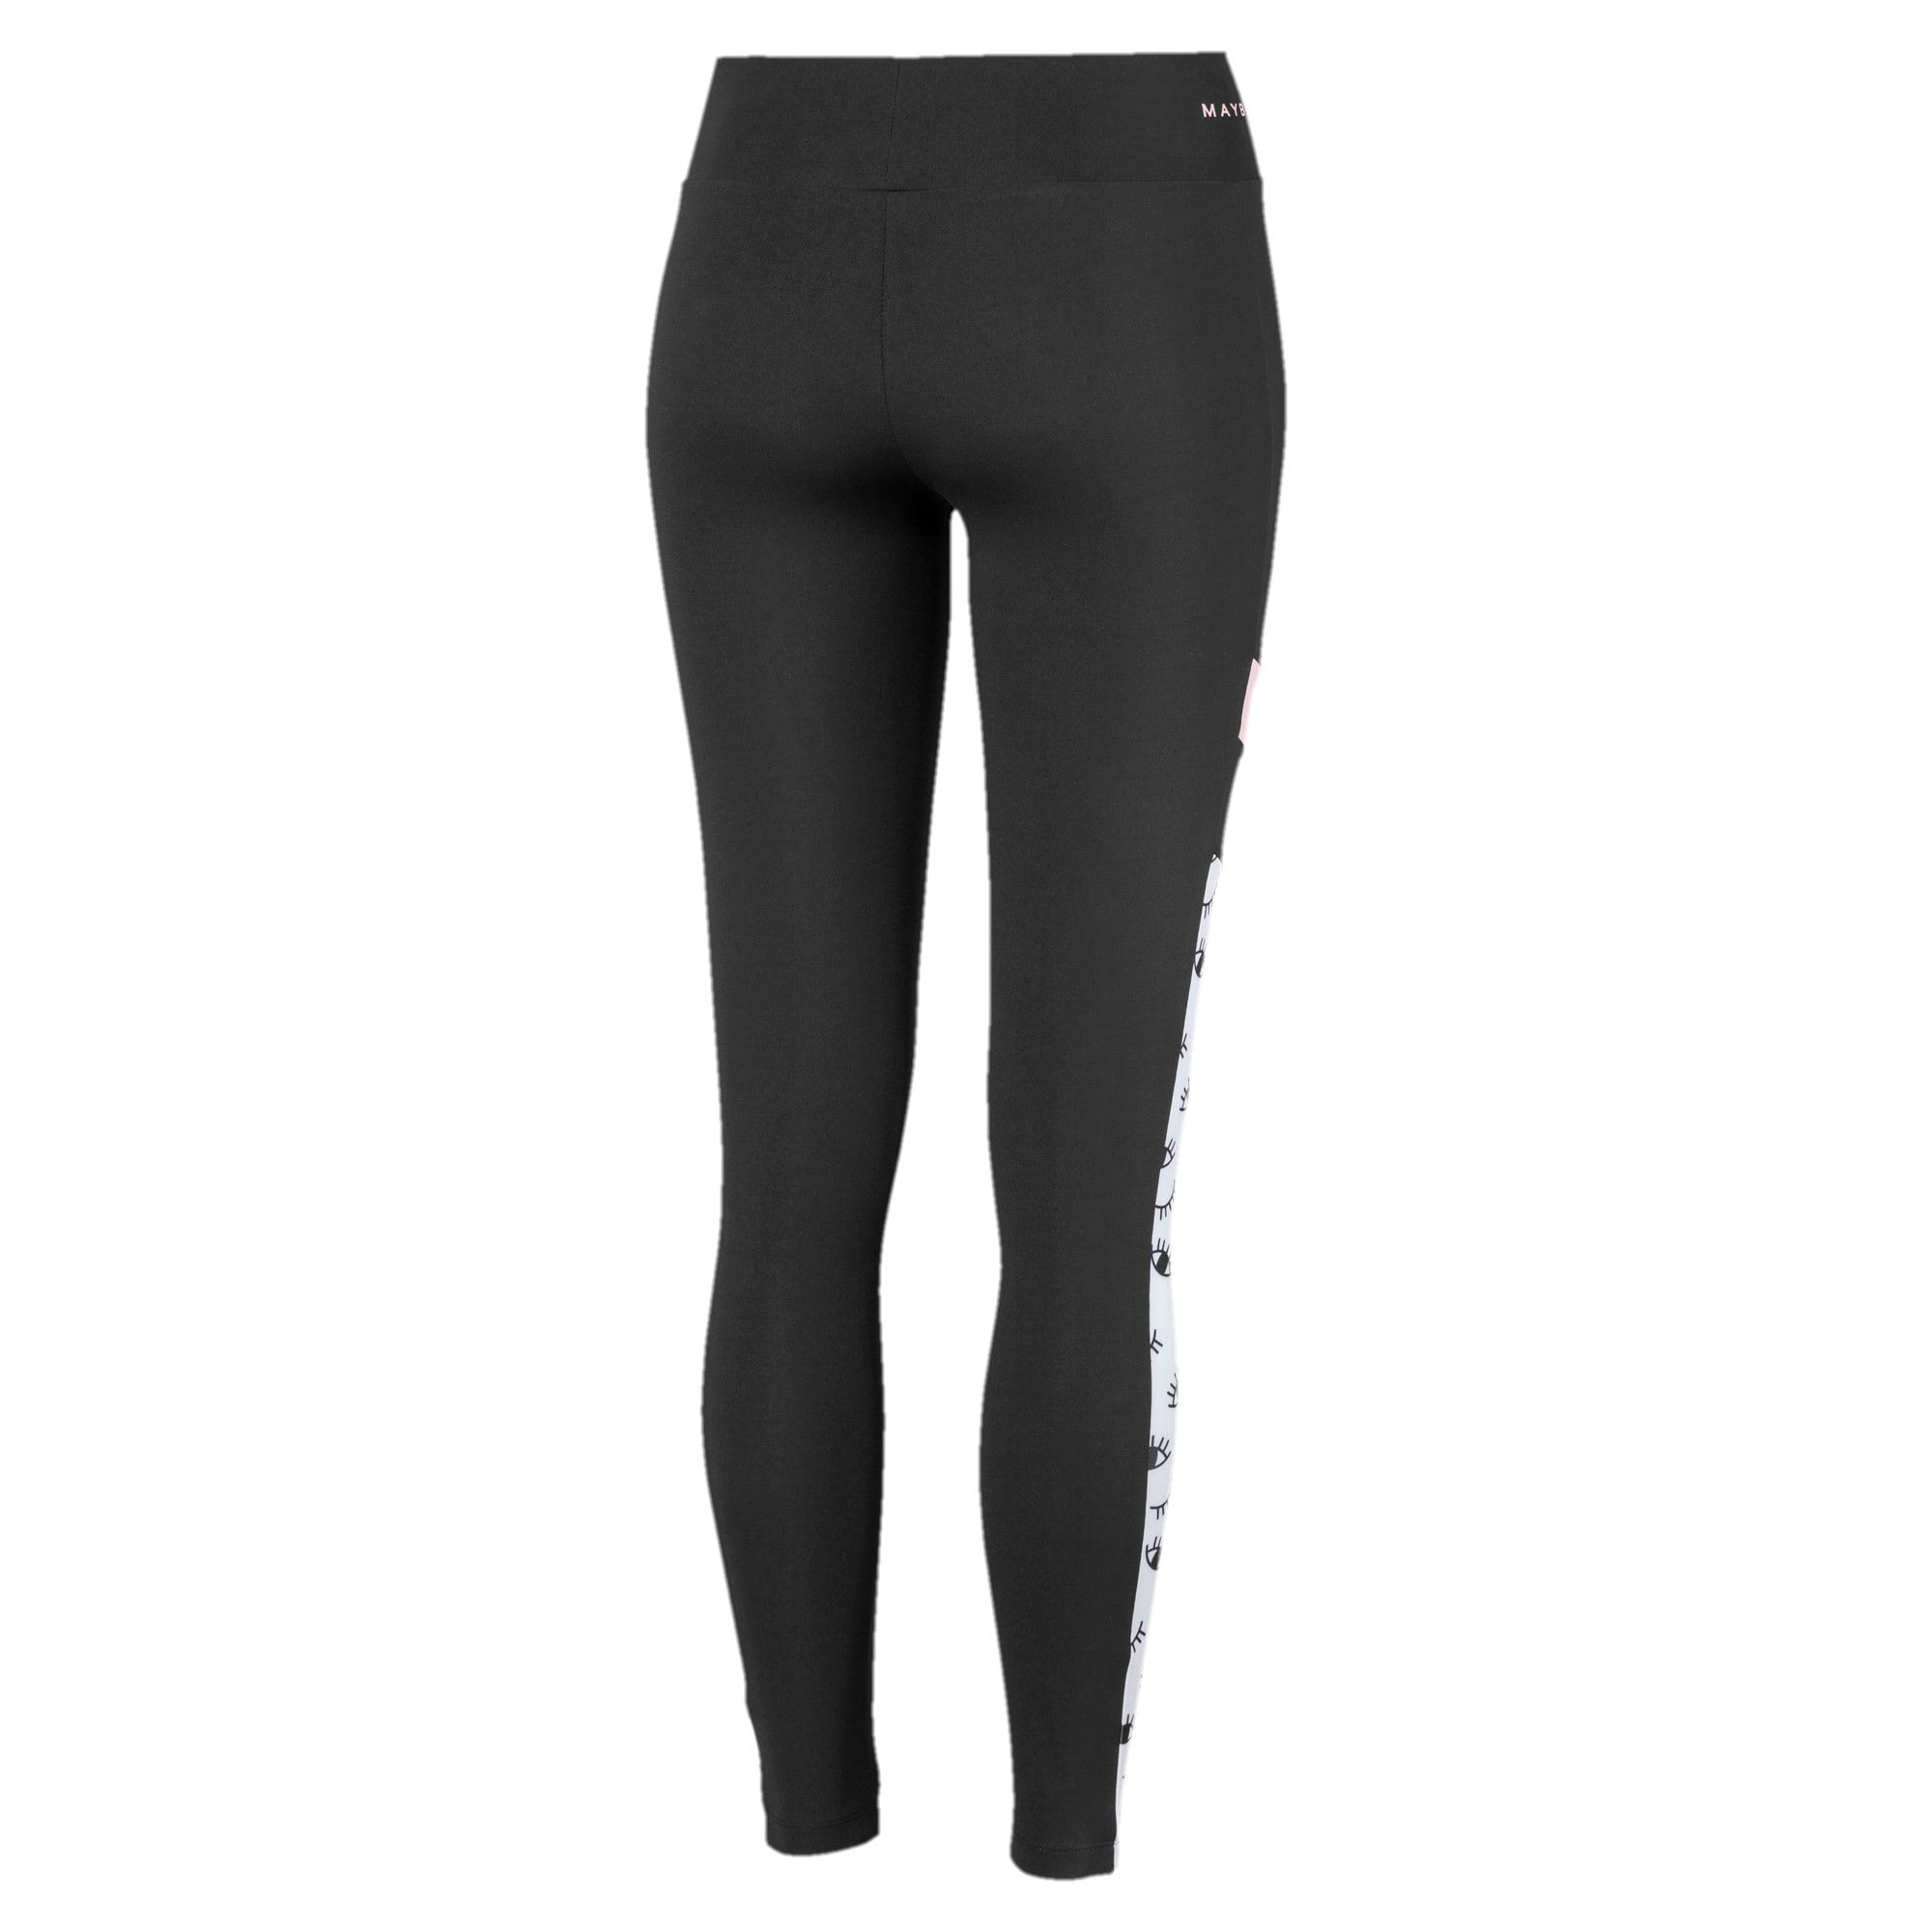 Thumbnail 2 van PUMA x MAYBELLINE legging voor vrouwen, Puma Black, medium